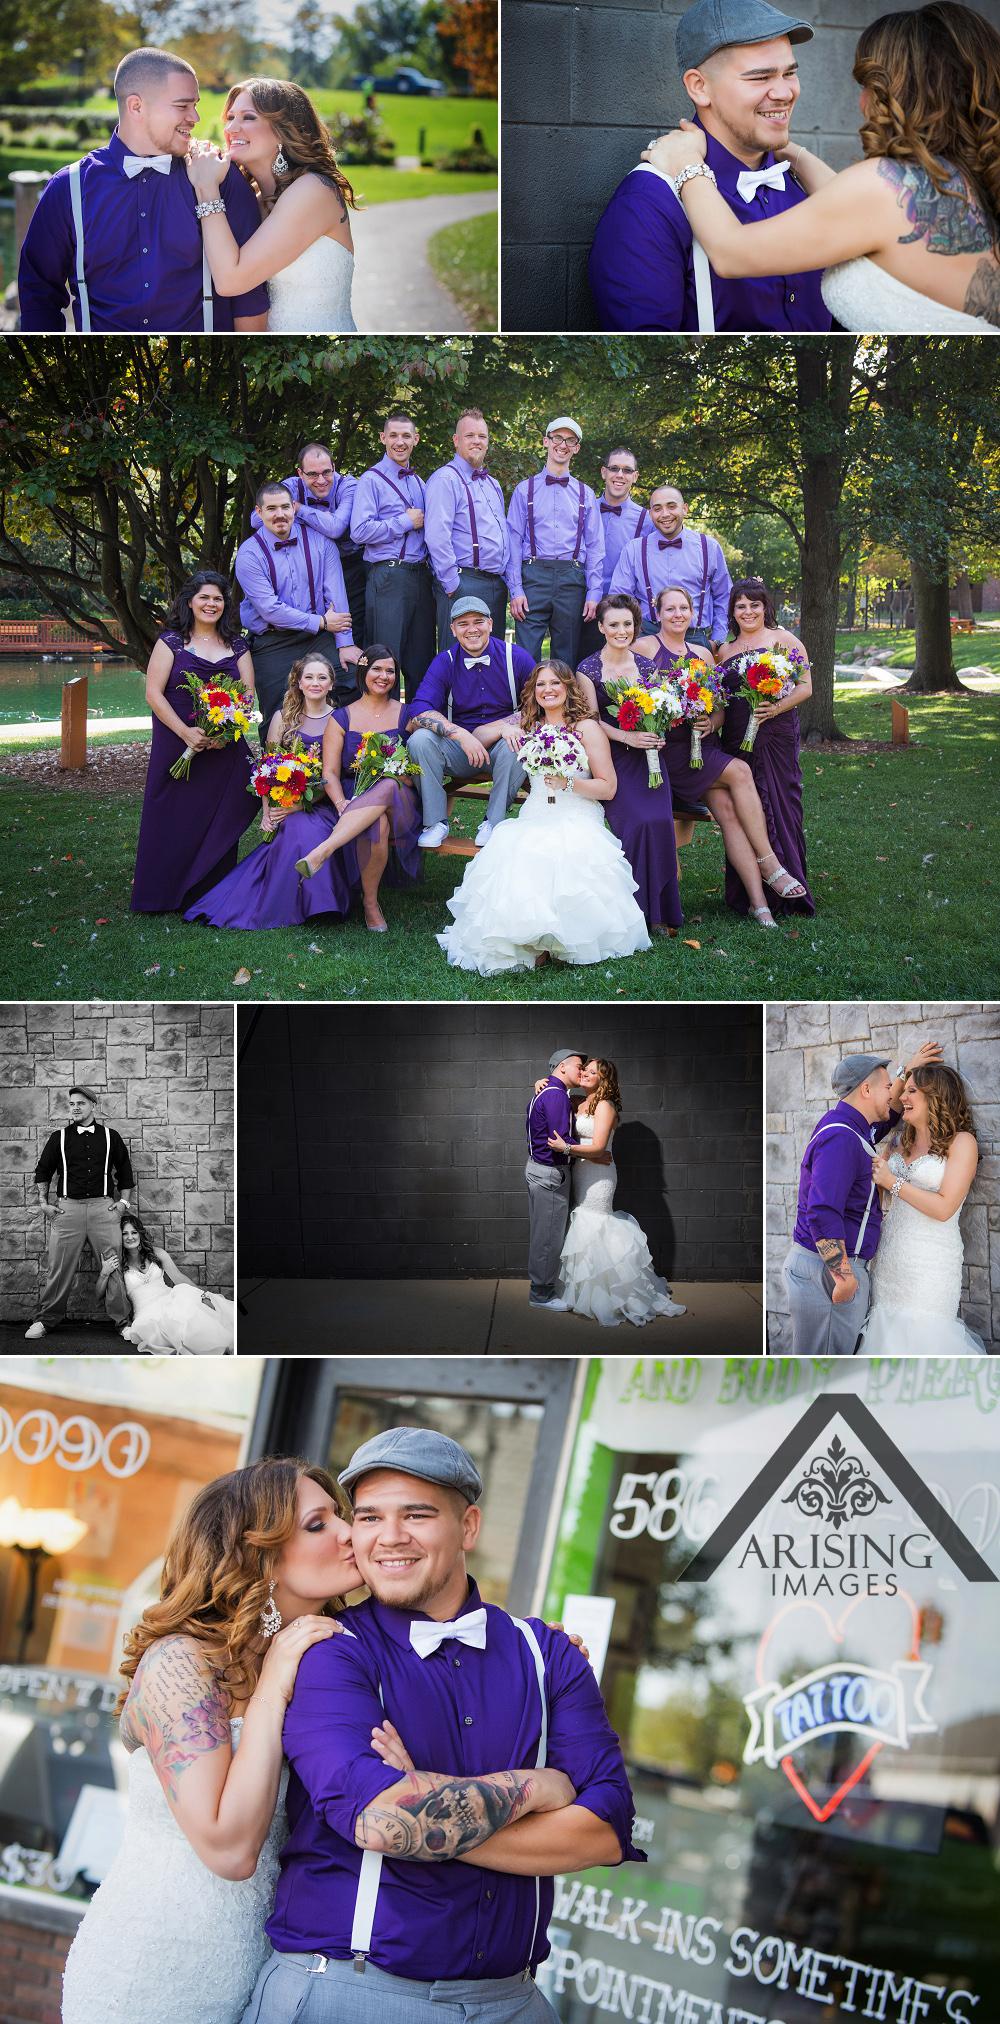 Edgy Detroit Wedding Photography